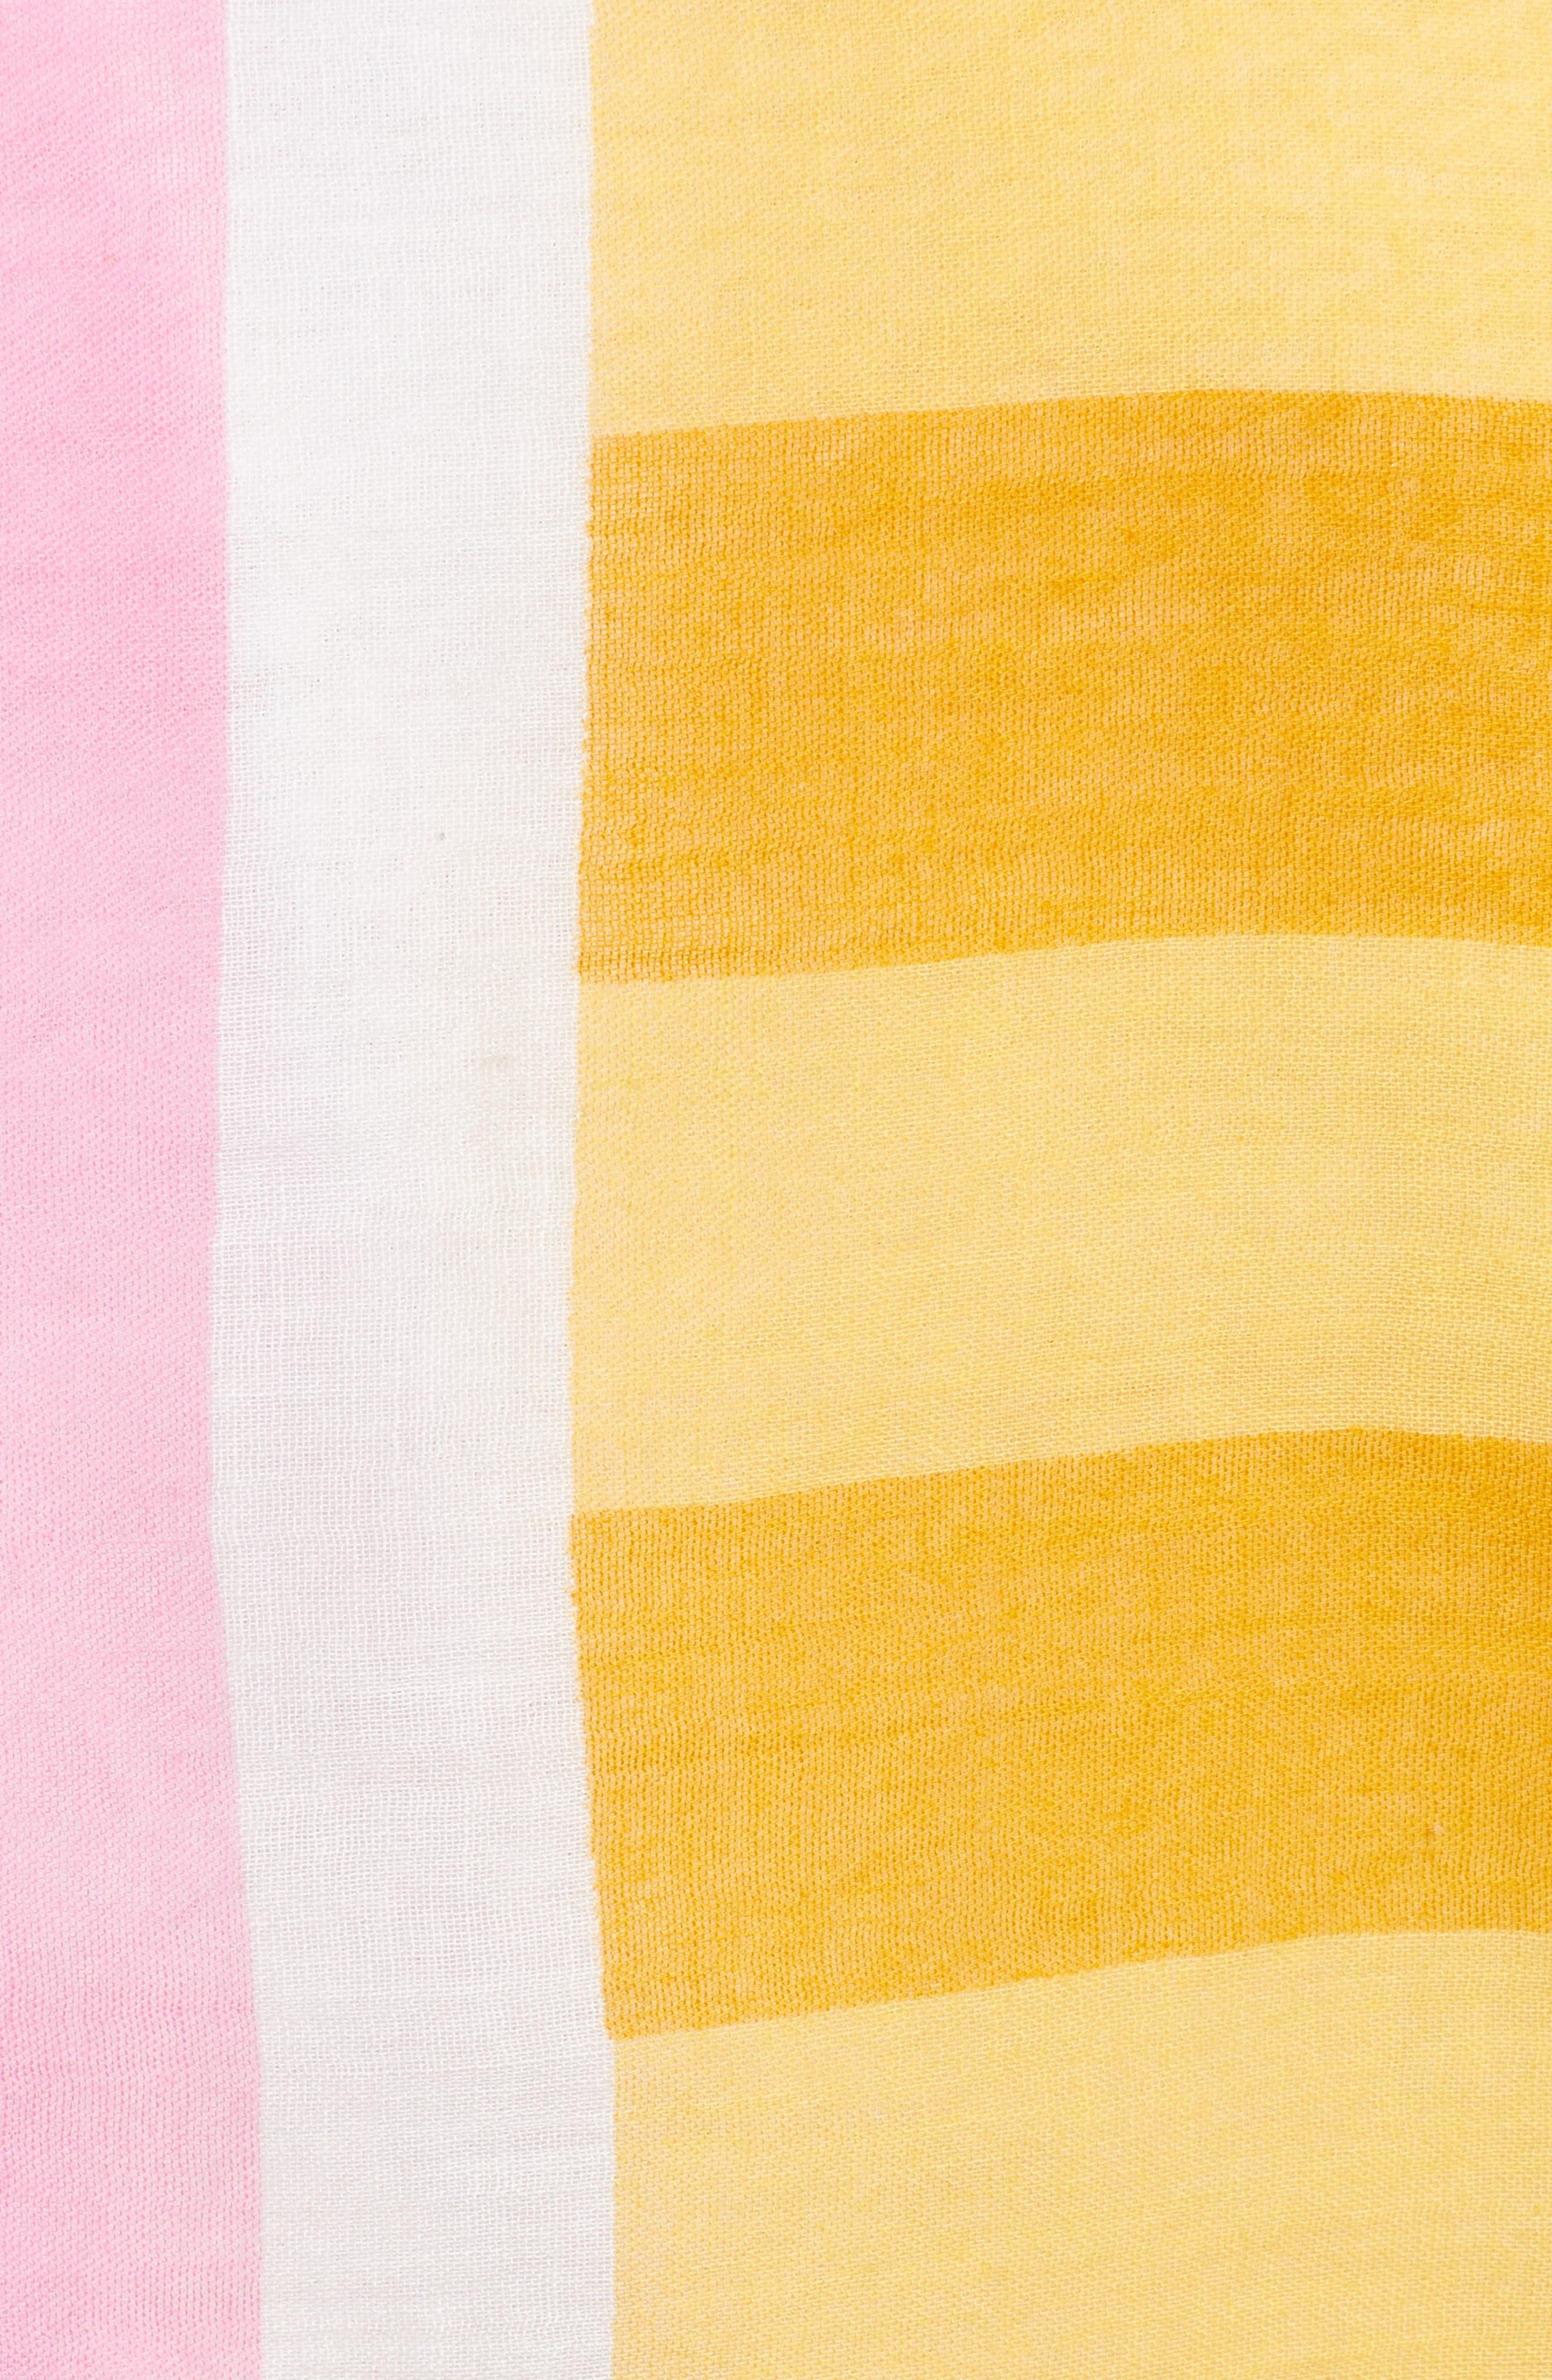 Fes Stripe Scarf,                             Alternate thumbnail 5, color,                             GOLD/PINK/CREAM